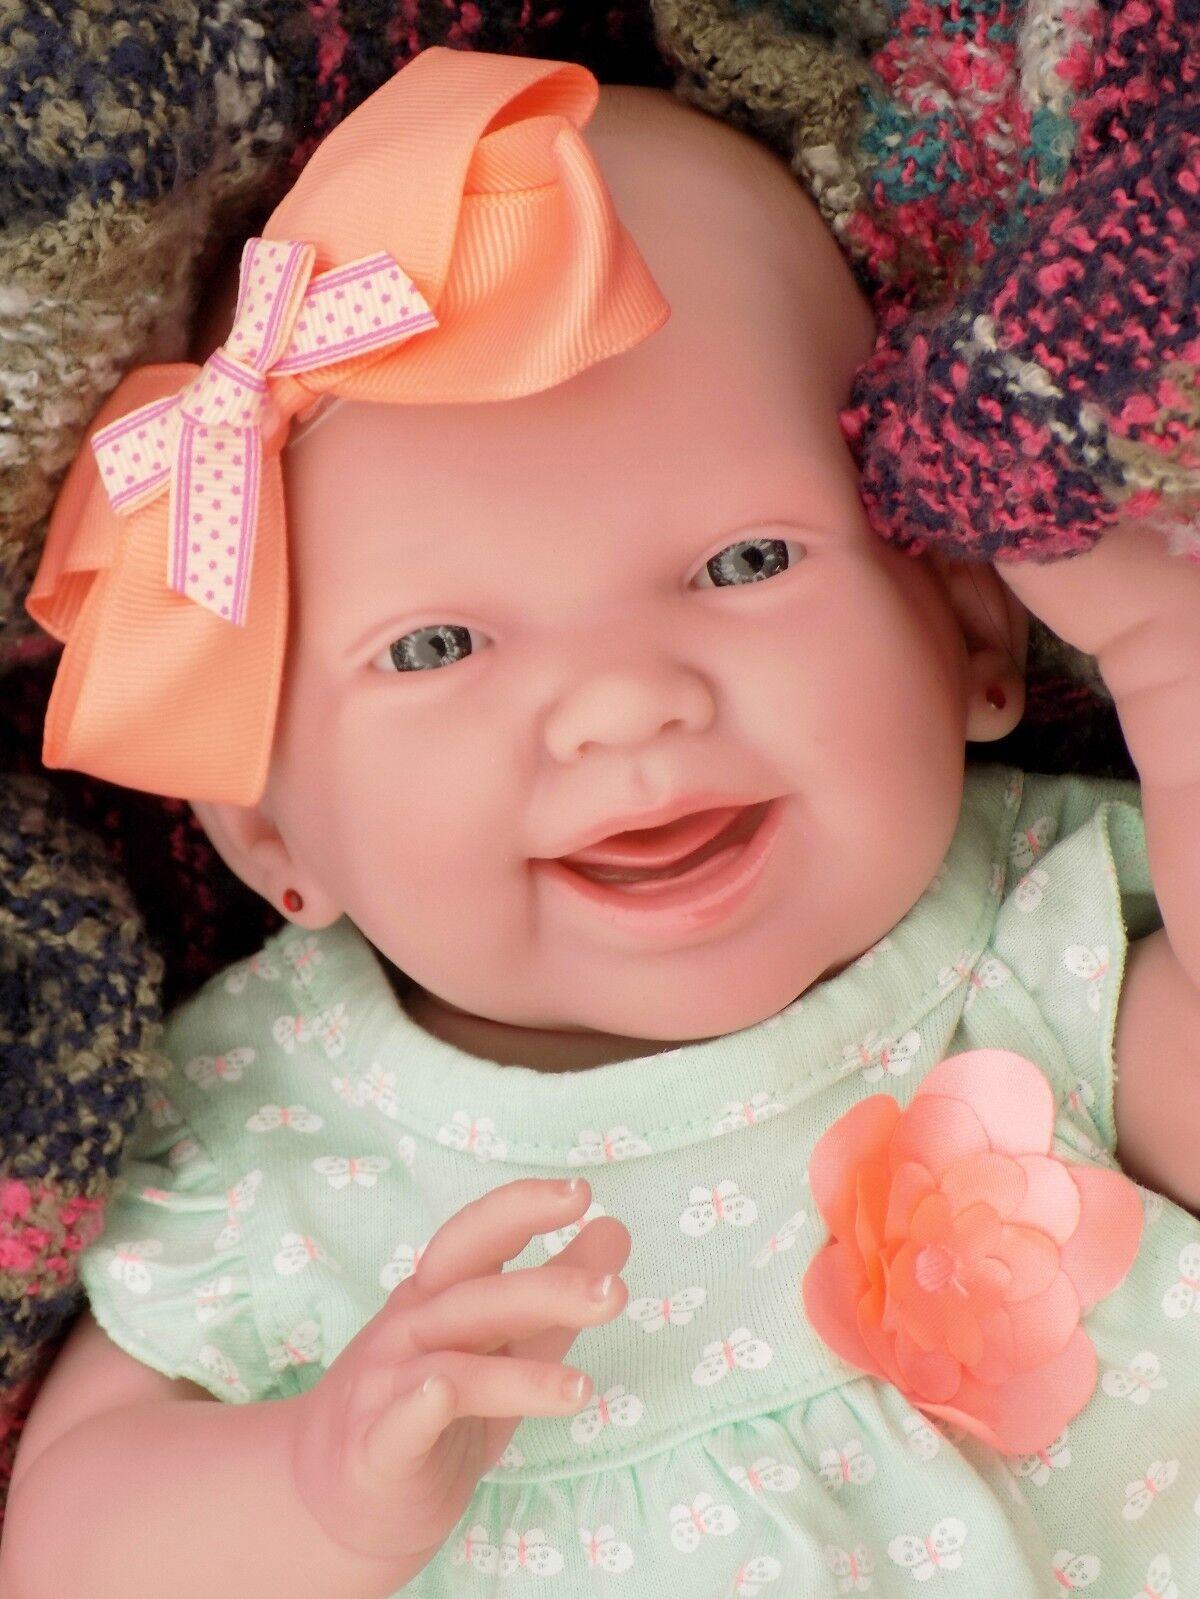 Muñeca Bebé Niña sonriente Real Reborn Berenguer realista de Silicona de vinilo de 15  pulgadas